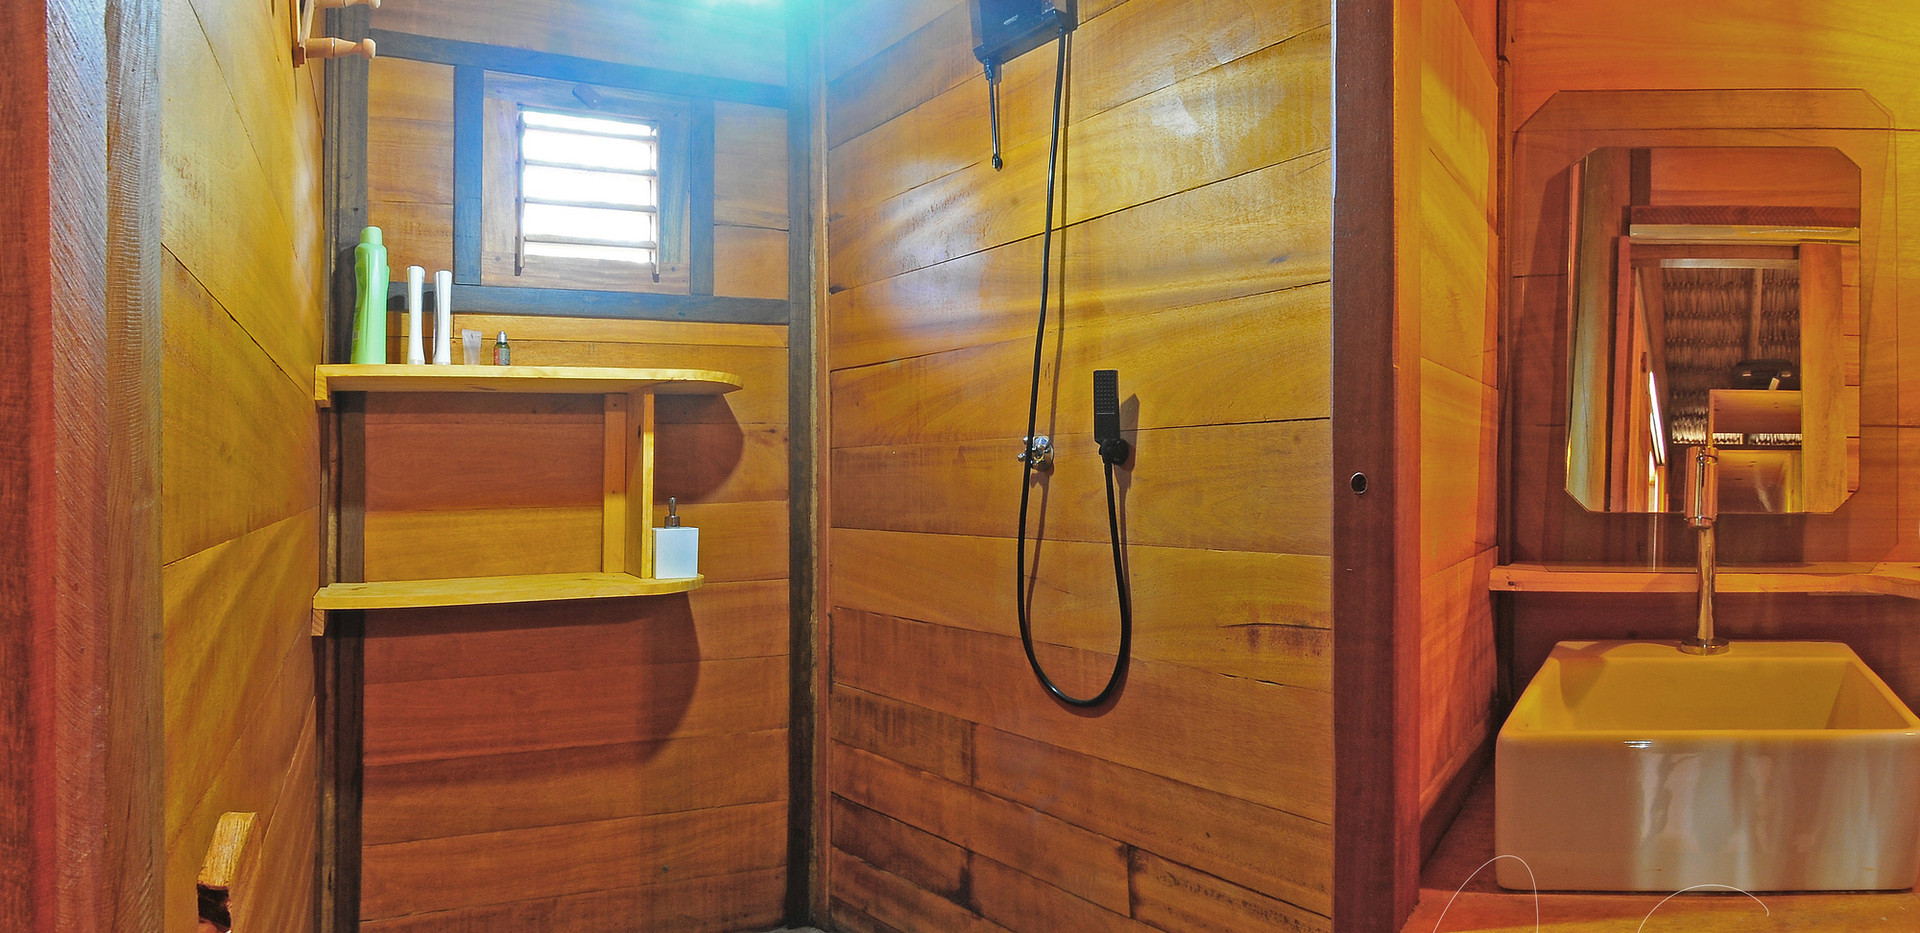 CasteloDoVentoPreaAccommodation-ChaletSu